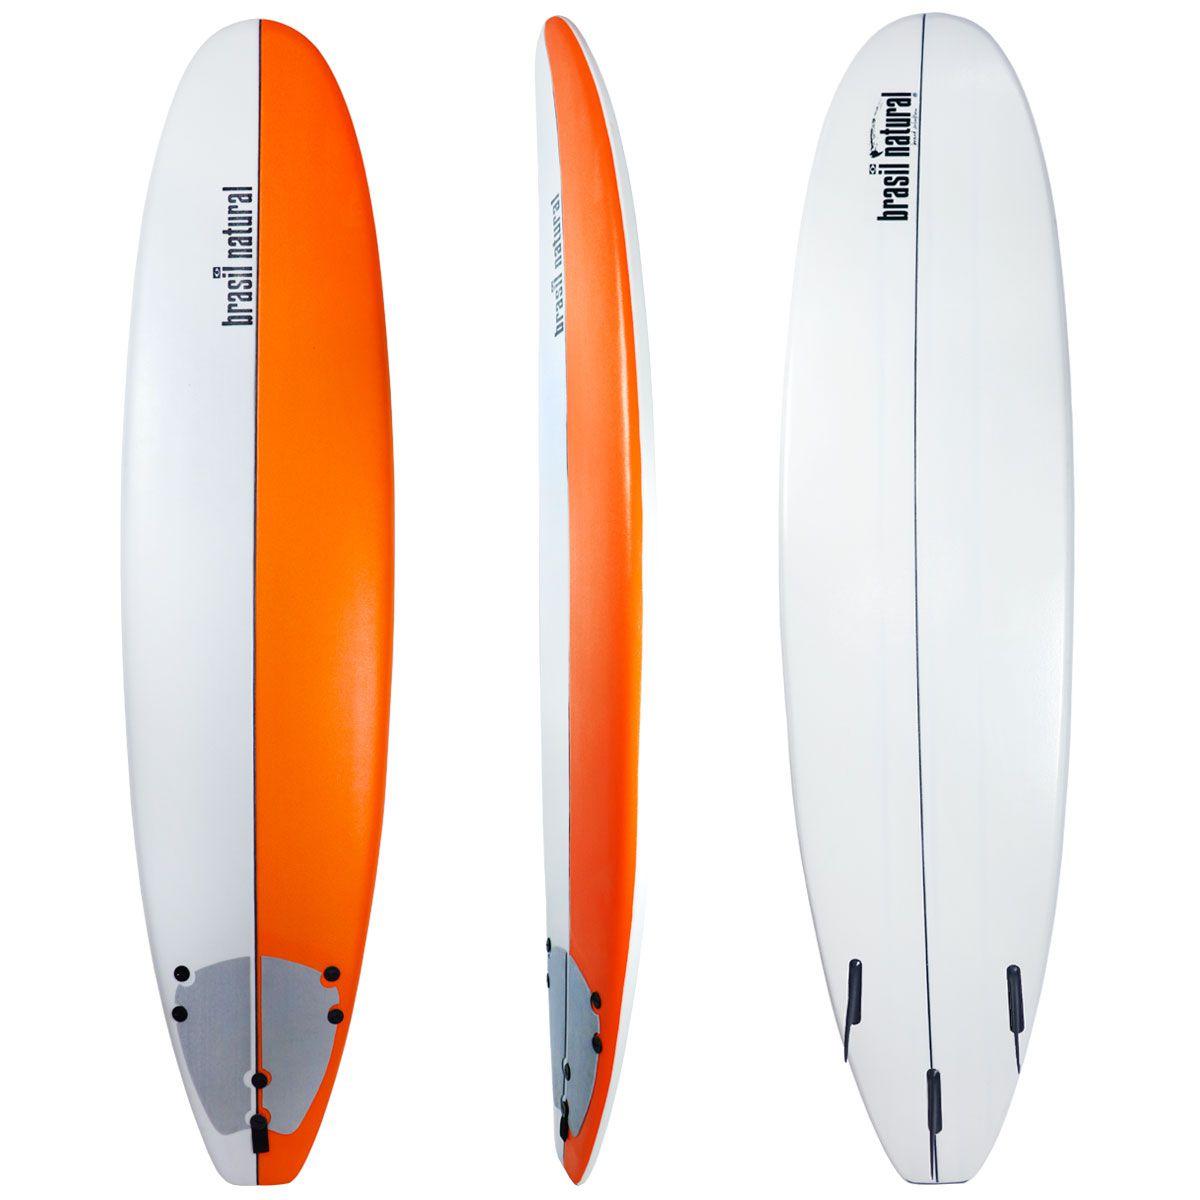 Prancha de surf fun board 7.6 edição limitada+ kit surf - Brasil Natural